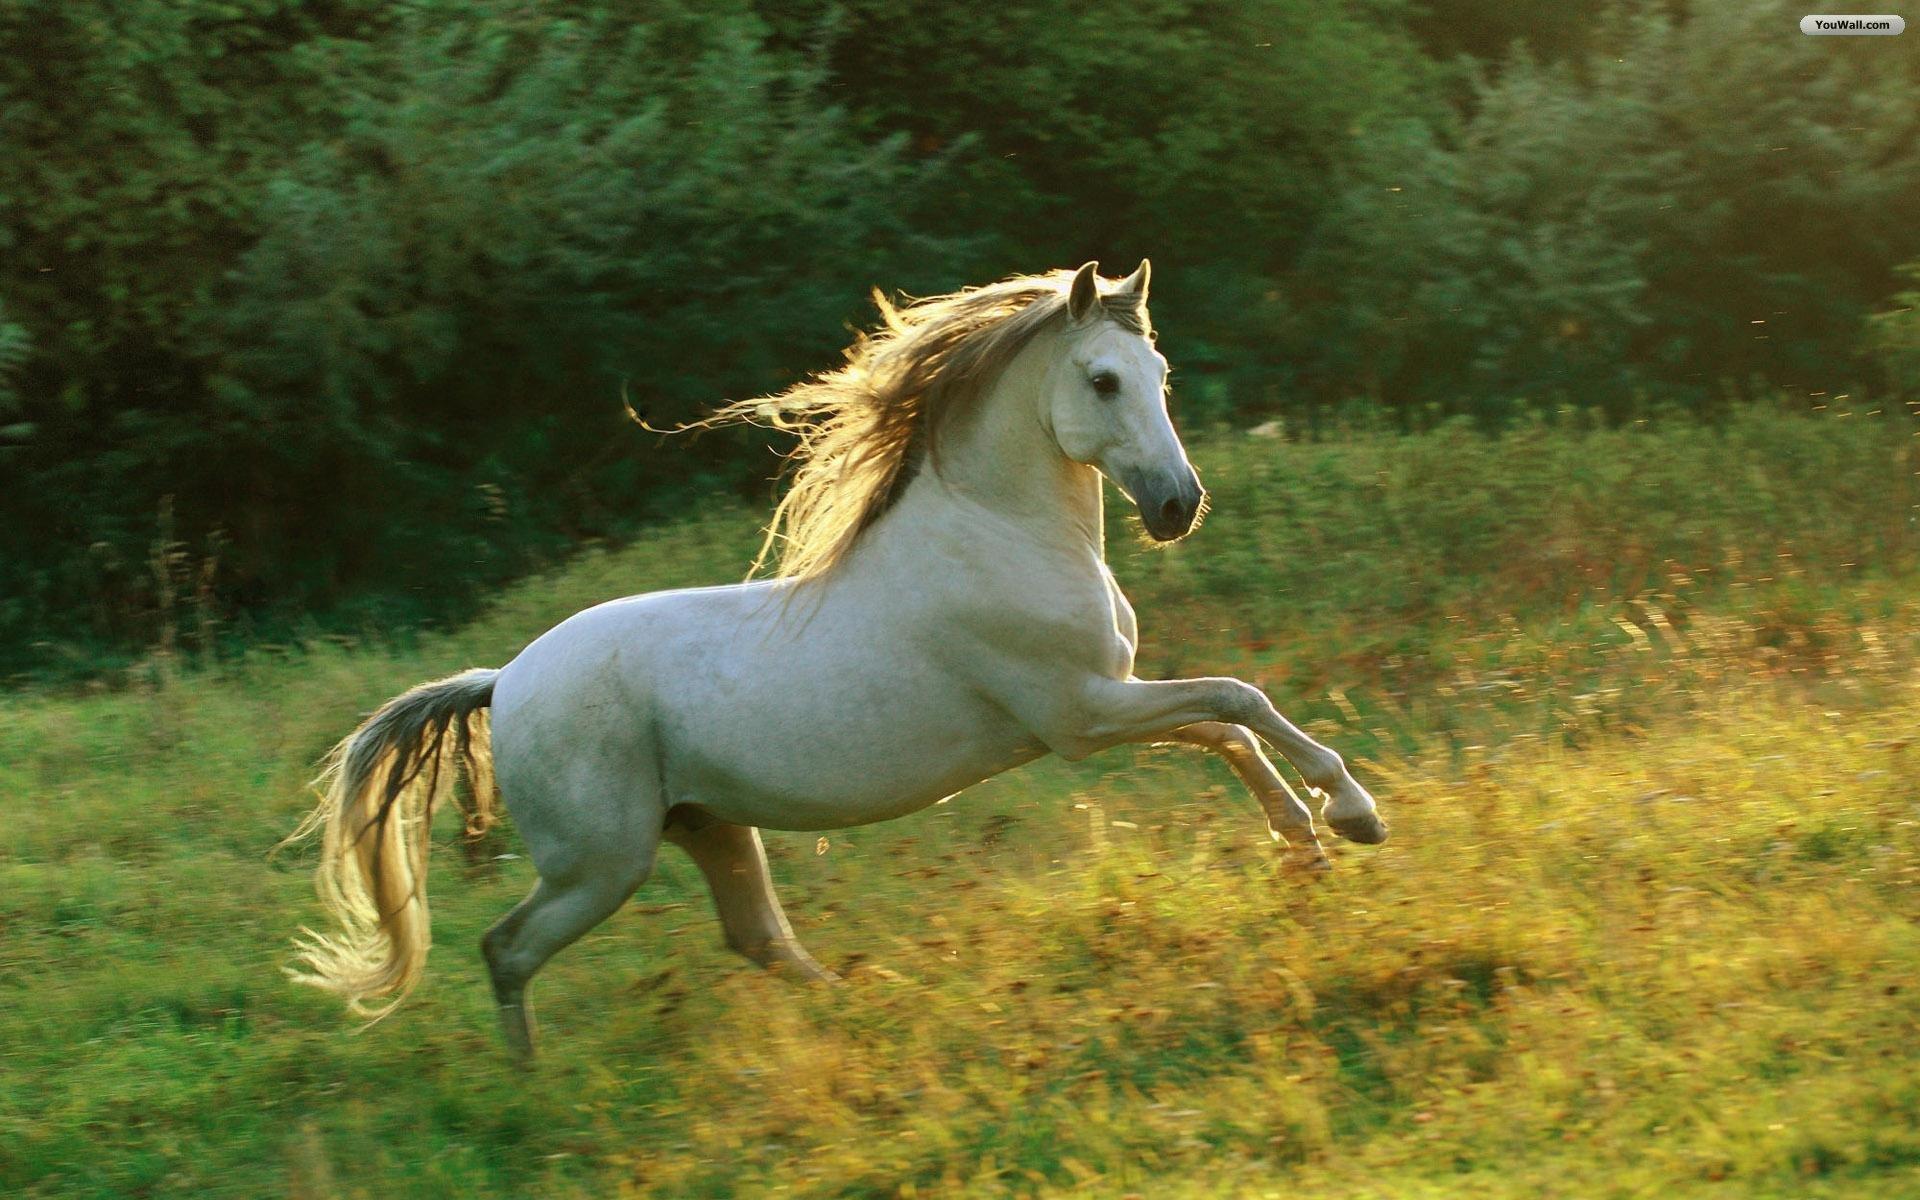 Beautiful White Horse Wallpaper Hd 02